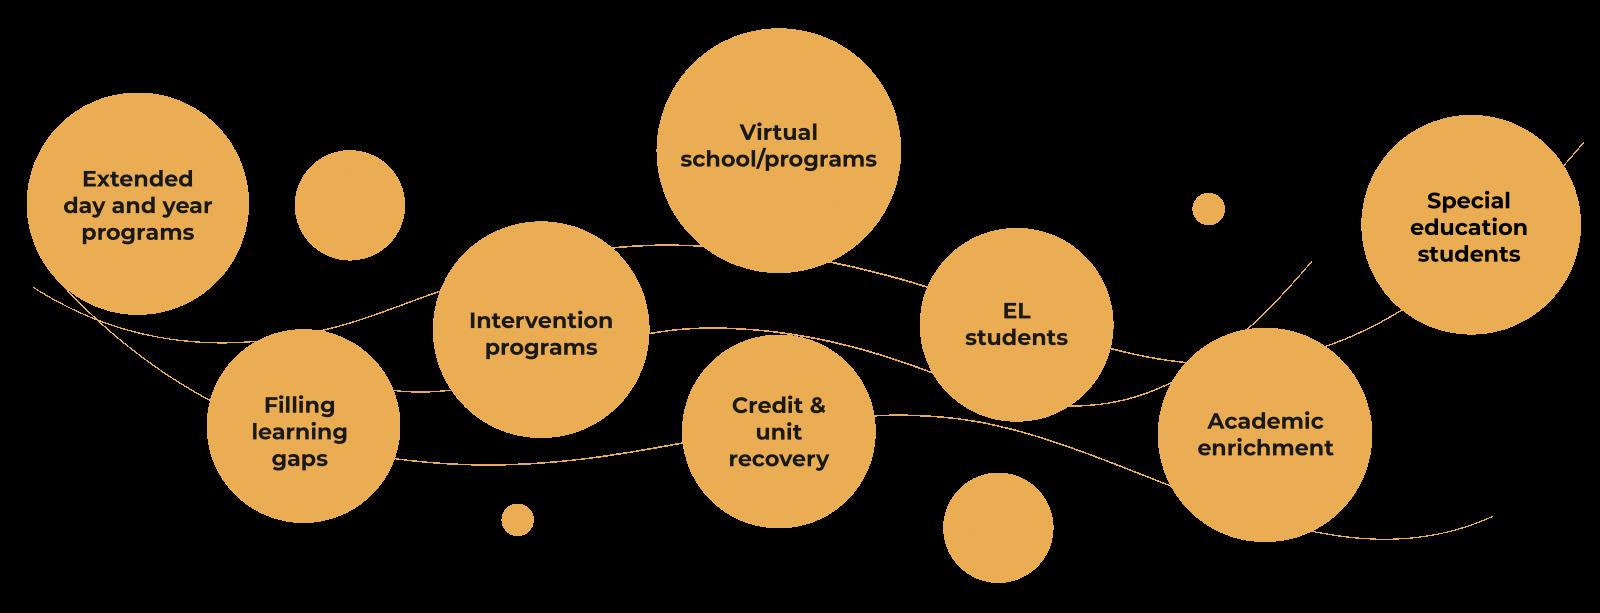 Funding Streams Graphic